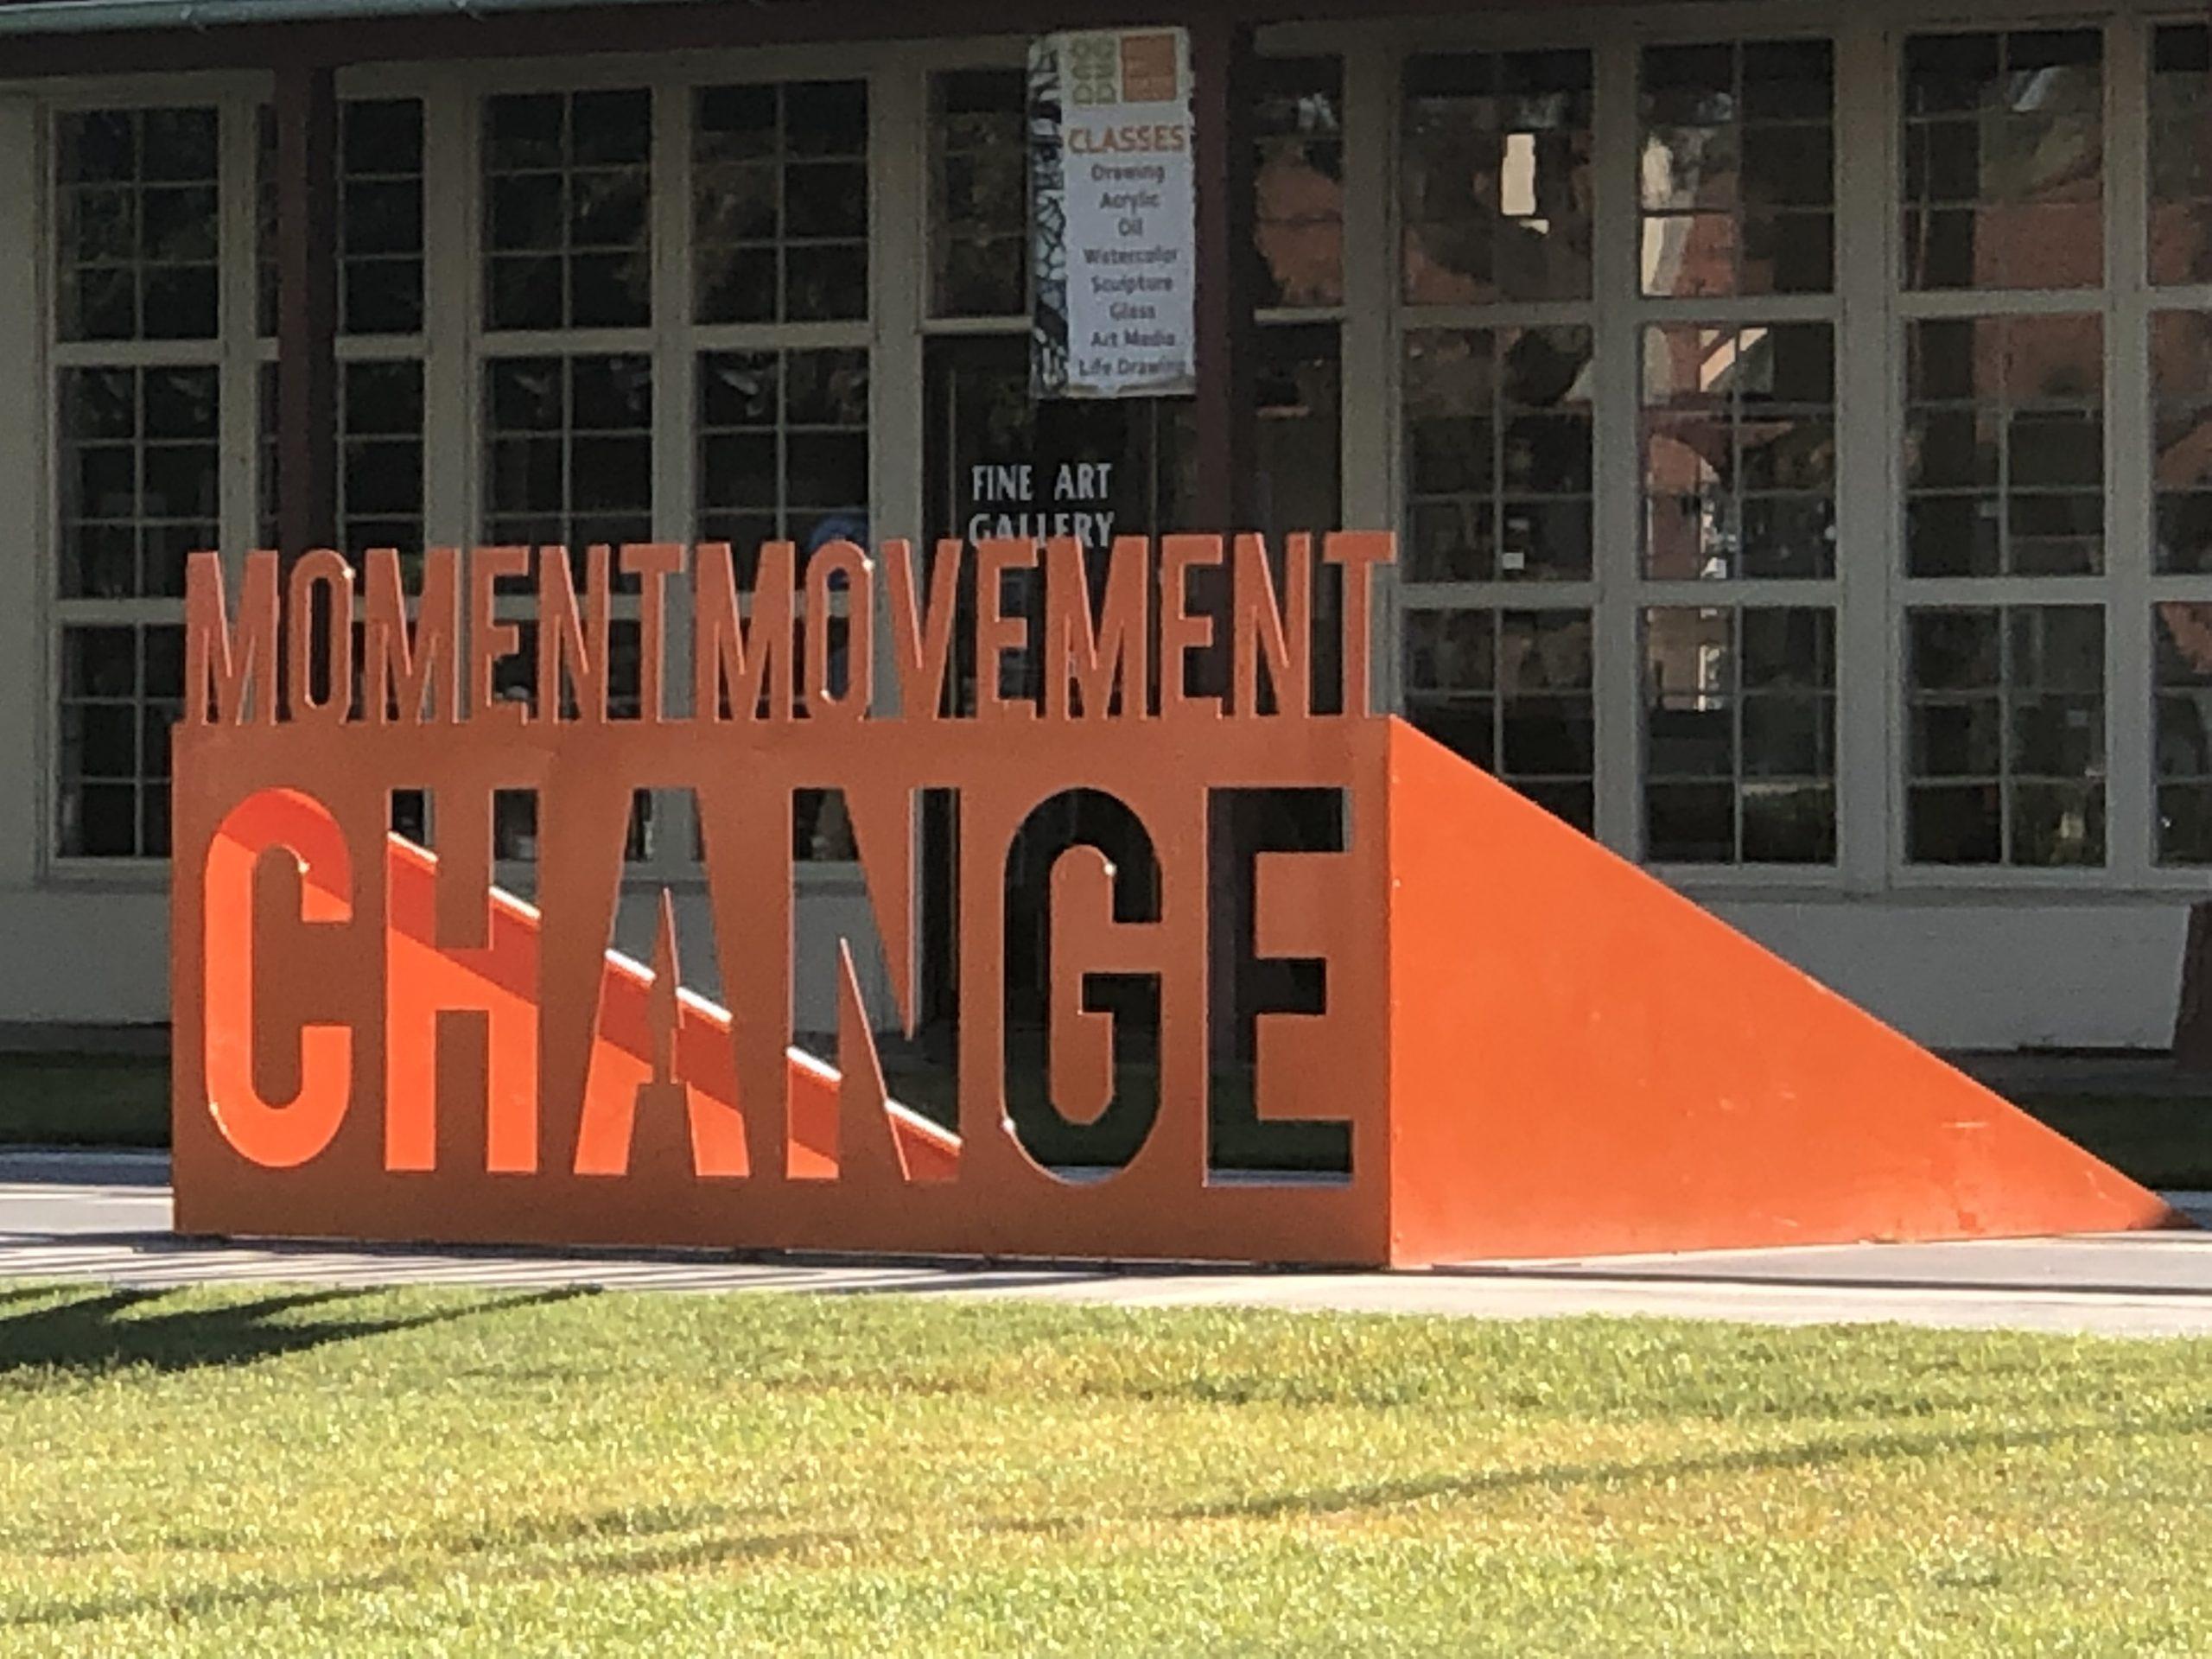 Moment Movement Change